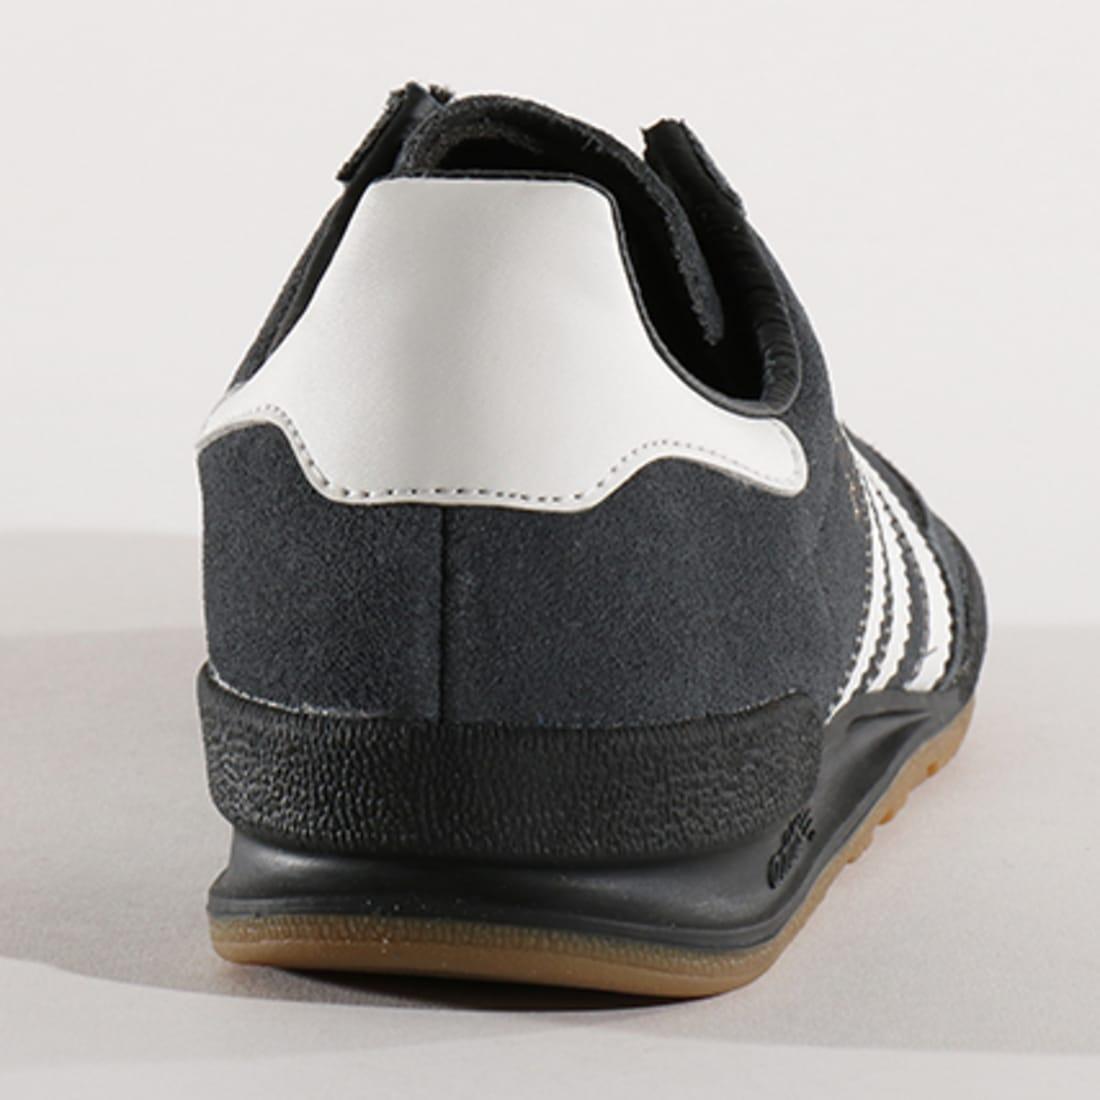 adidas Baskets Jeans CQ2768 Carbon Grey One Core Black